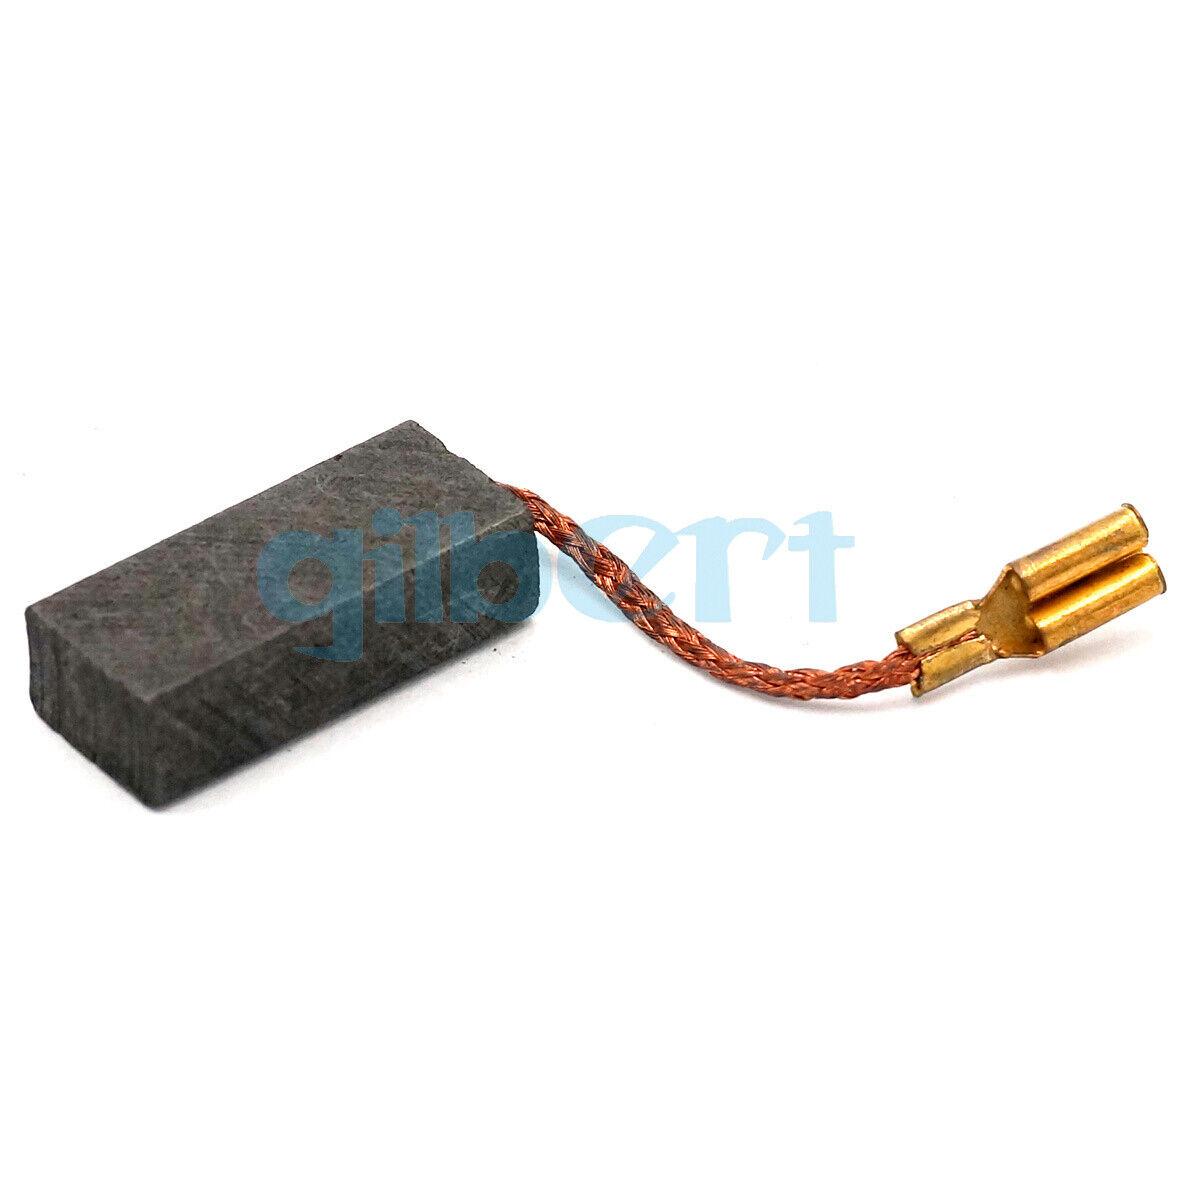 GWS 9-125 GWS 9-150 Carbon Brushes For Bosch 019 Die Grinder 5X8X16mm GWS 6-100